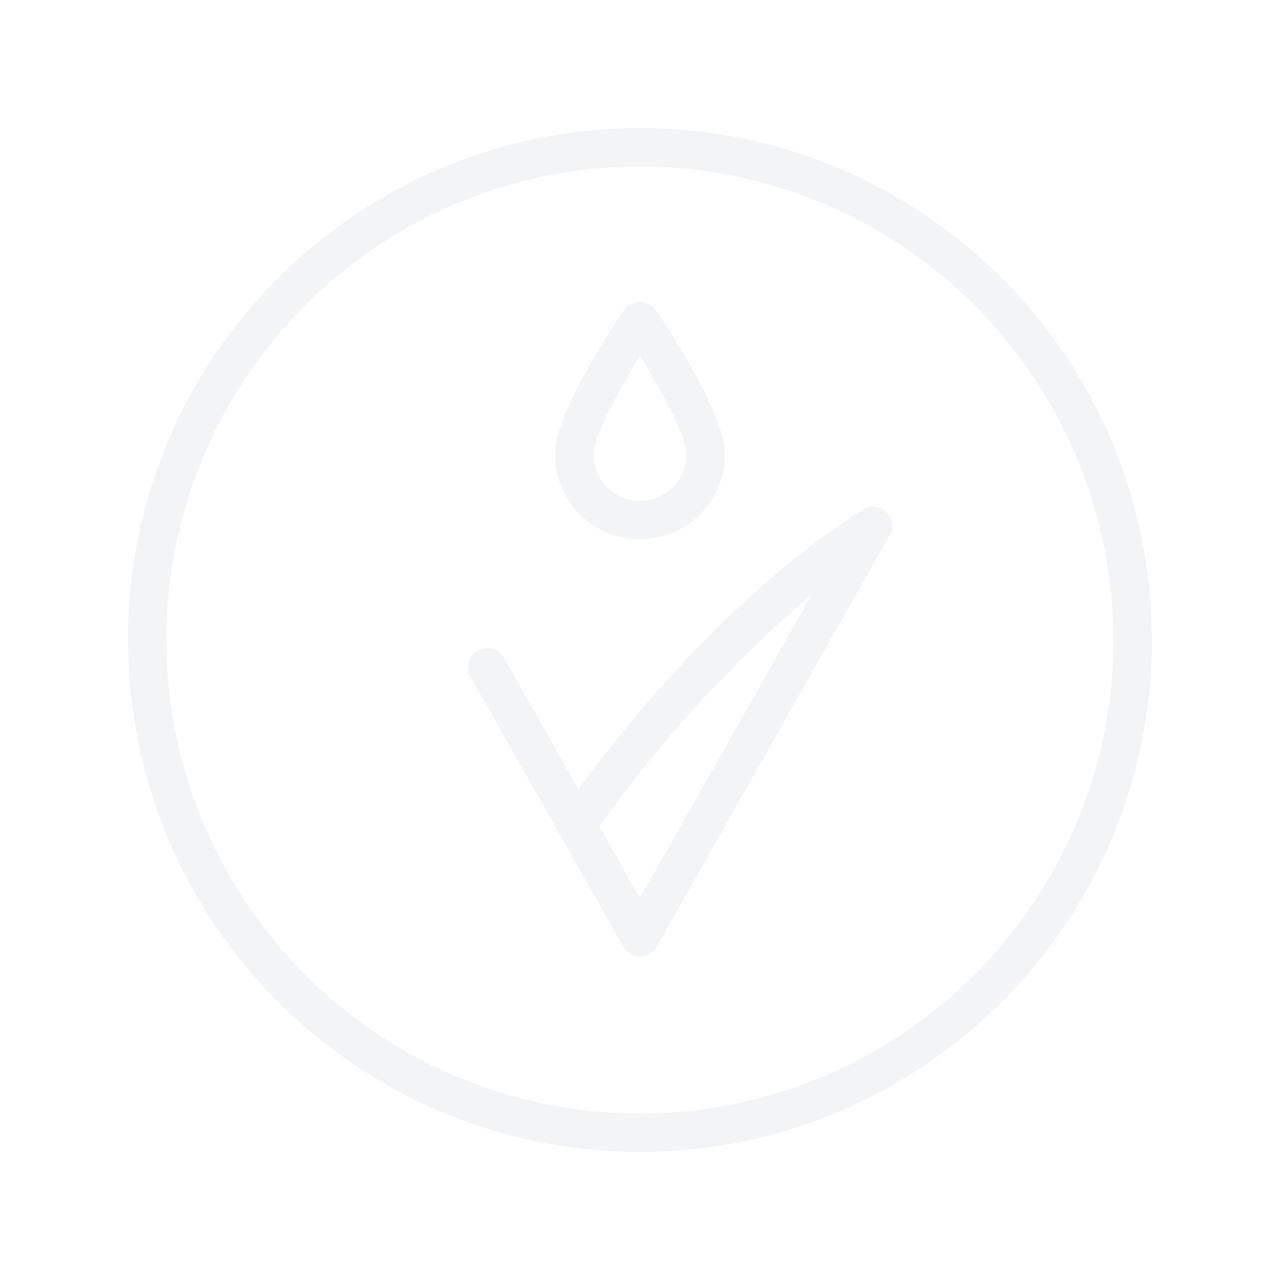 MACADAMIA Professional Endless Summer After Sun Leave-In увлйжняющиц спрей для волос 118ml